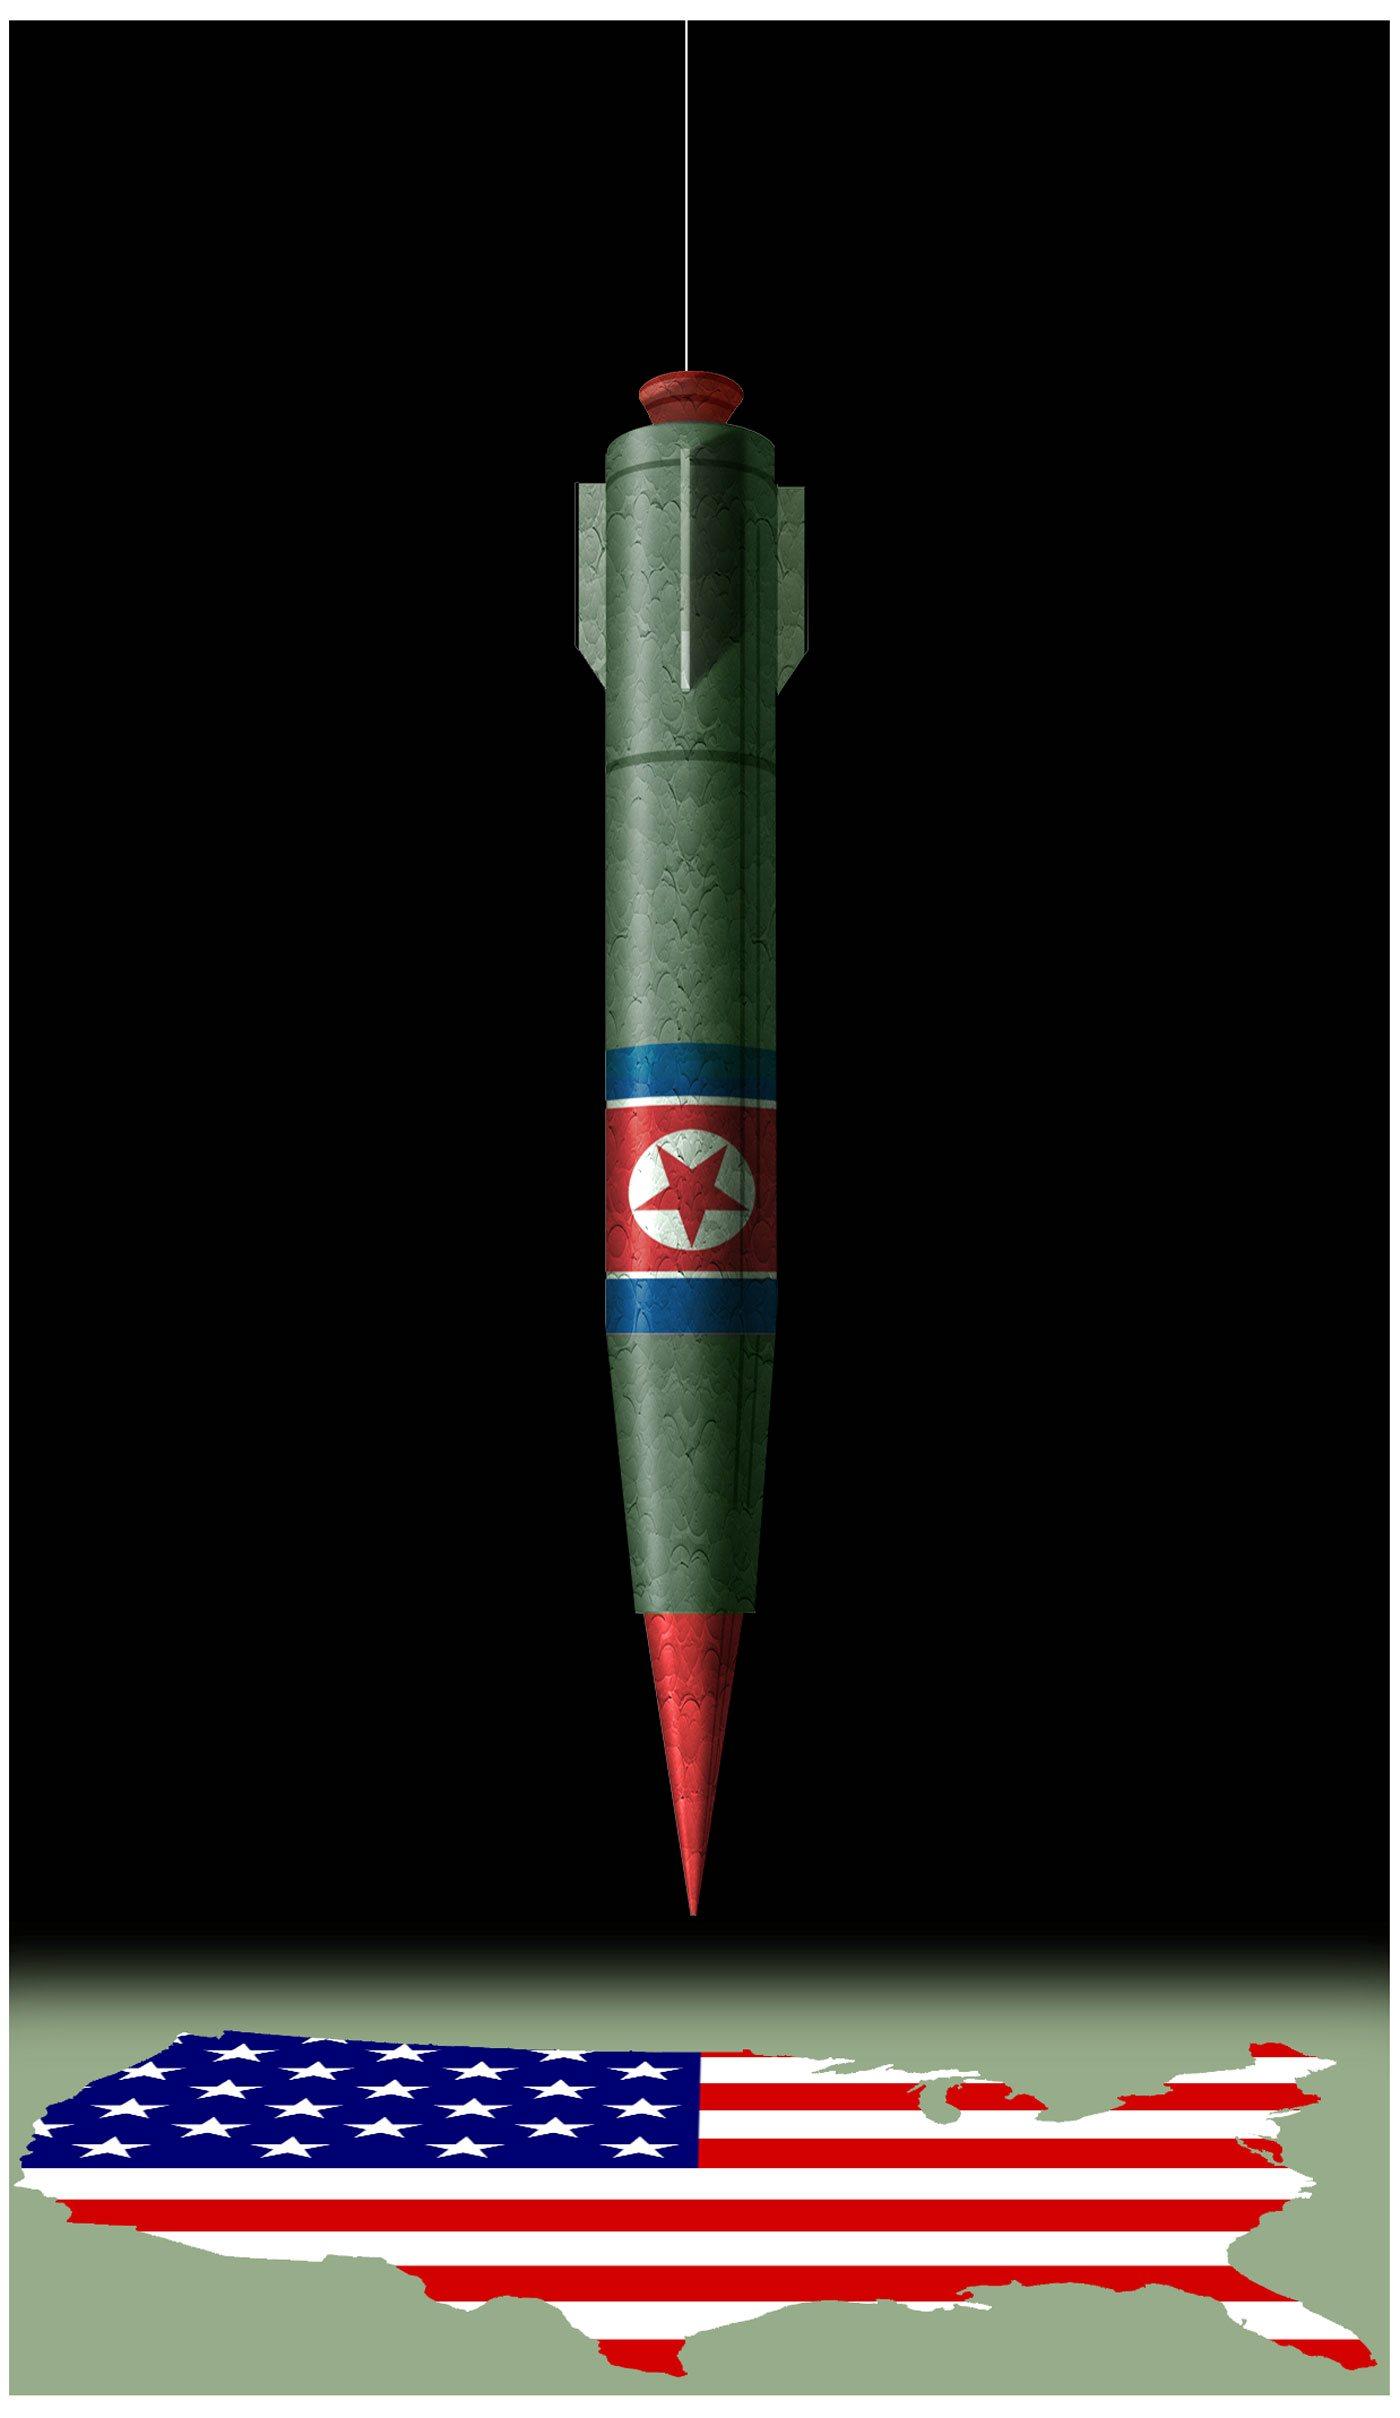 When Democrats surrender to Kim Jong-un